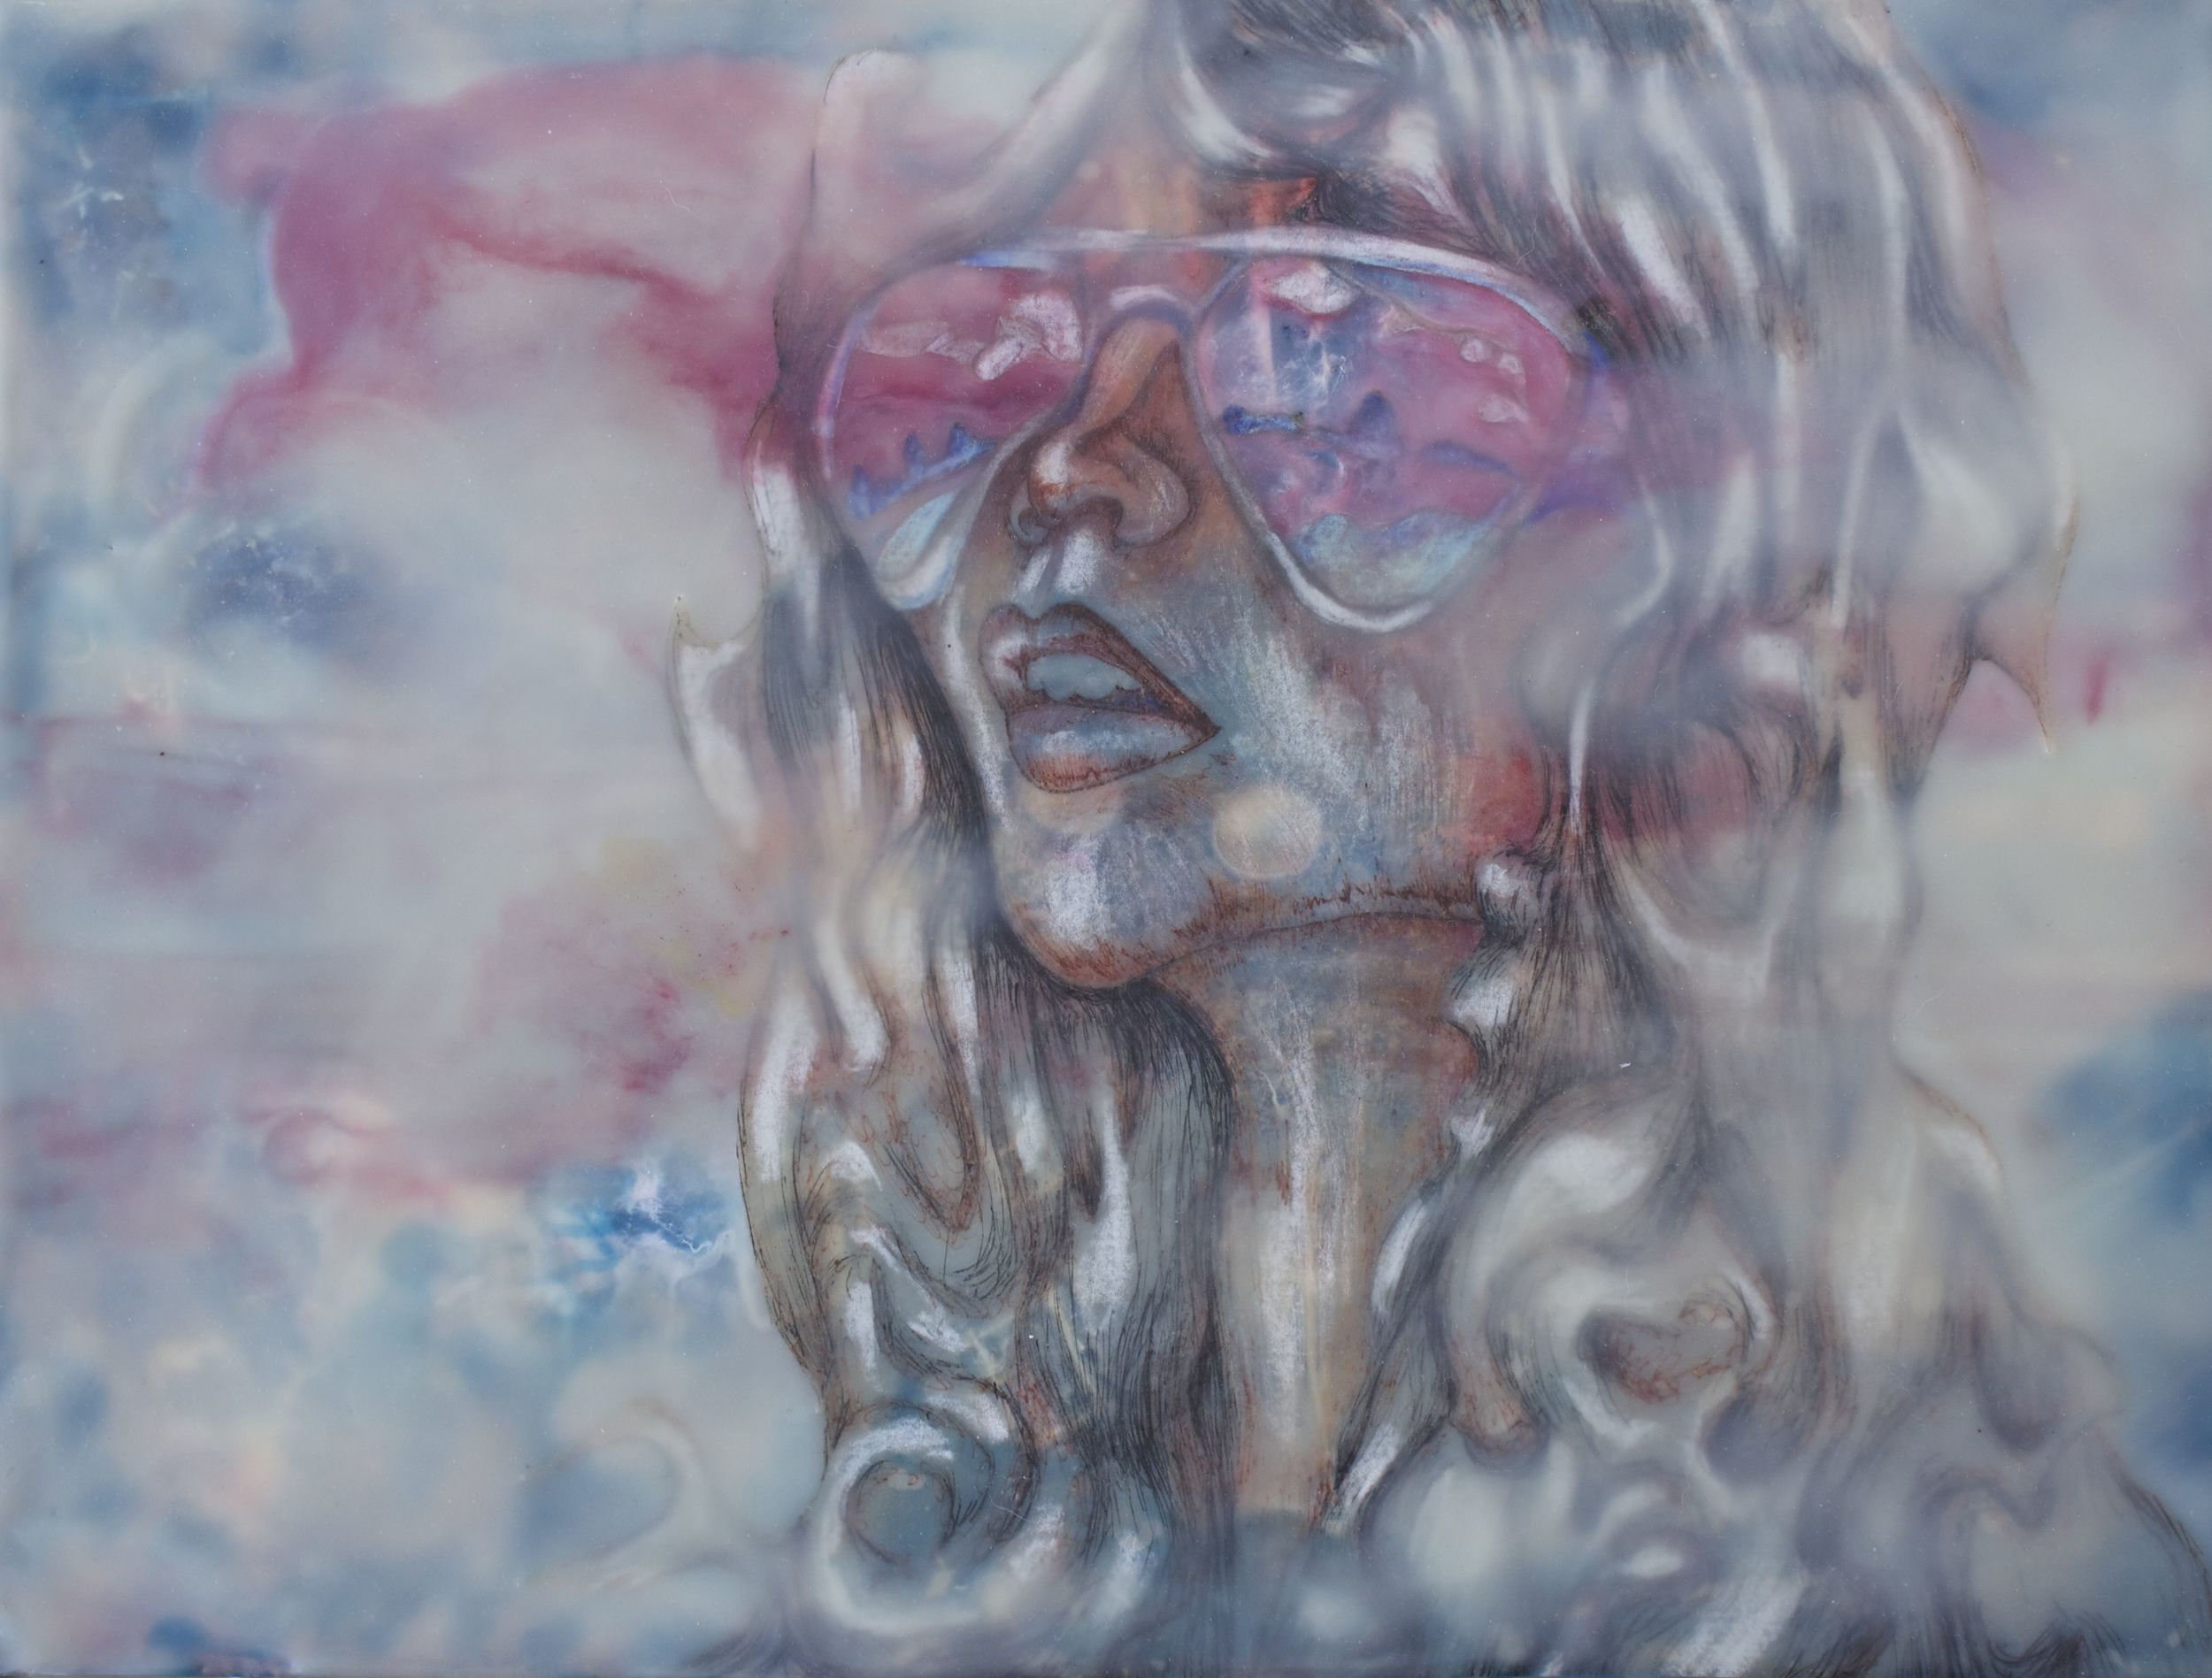 Her Glasses #1  9x12  Encaustic  $260